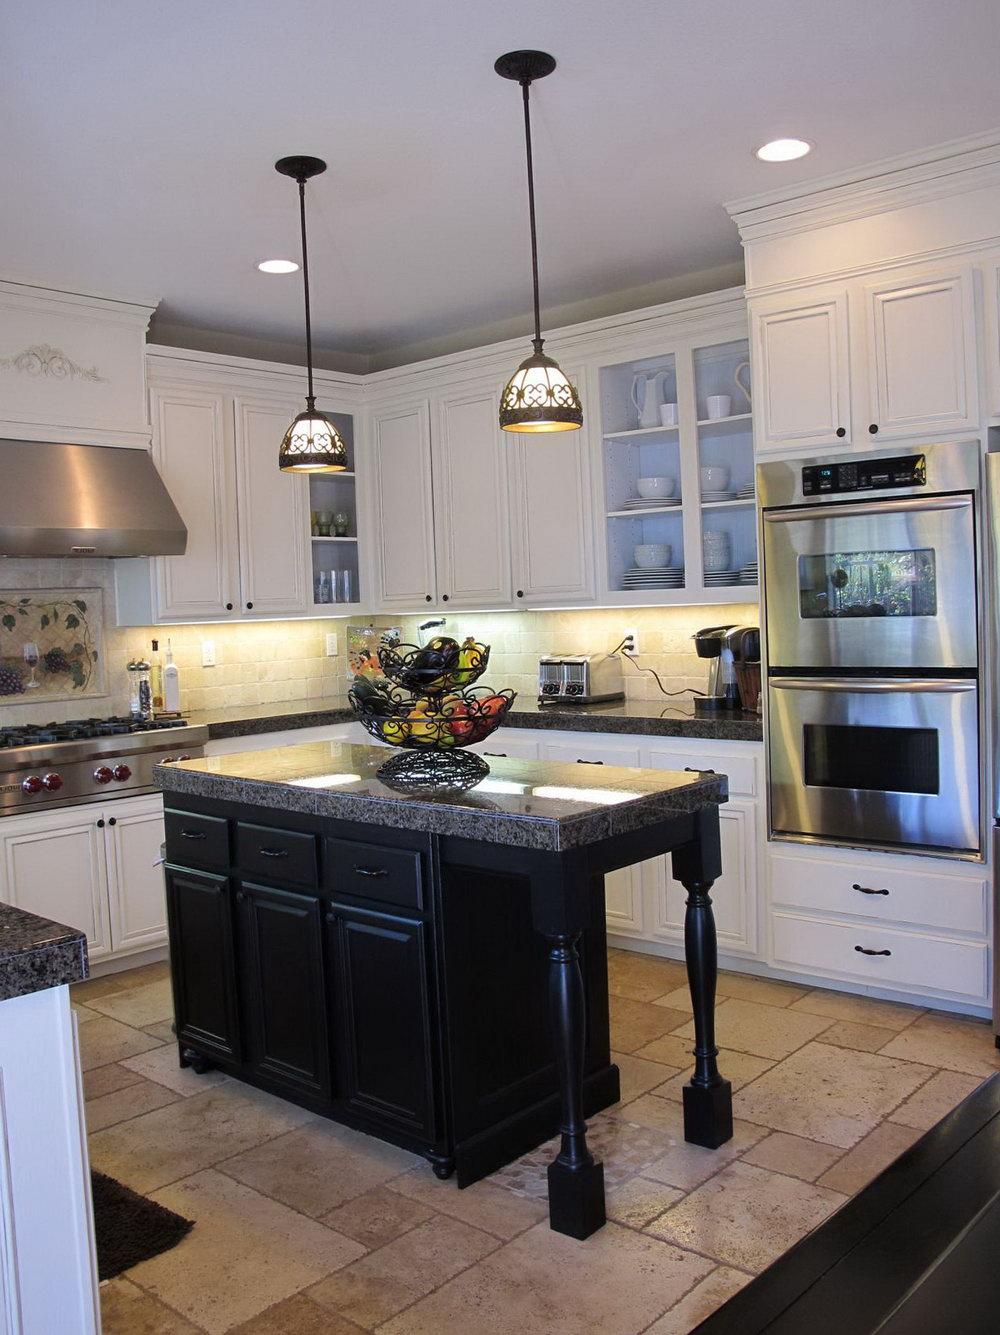 Kitchen Cabinet White And Black